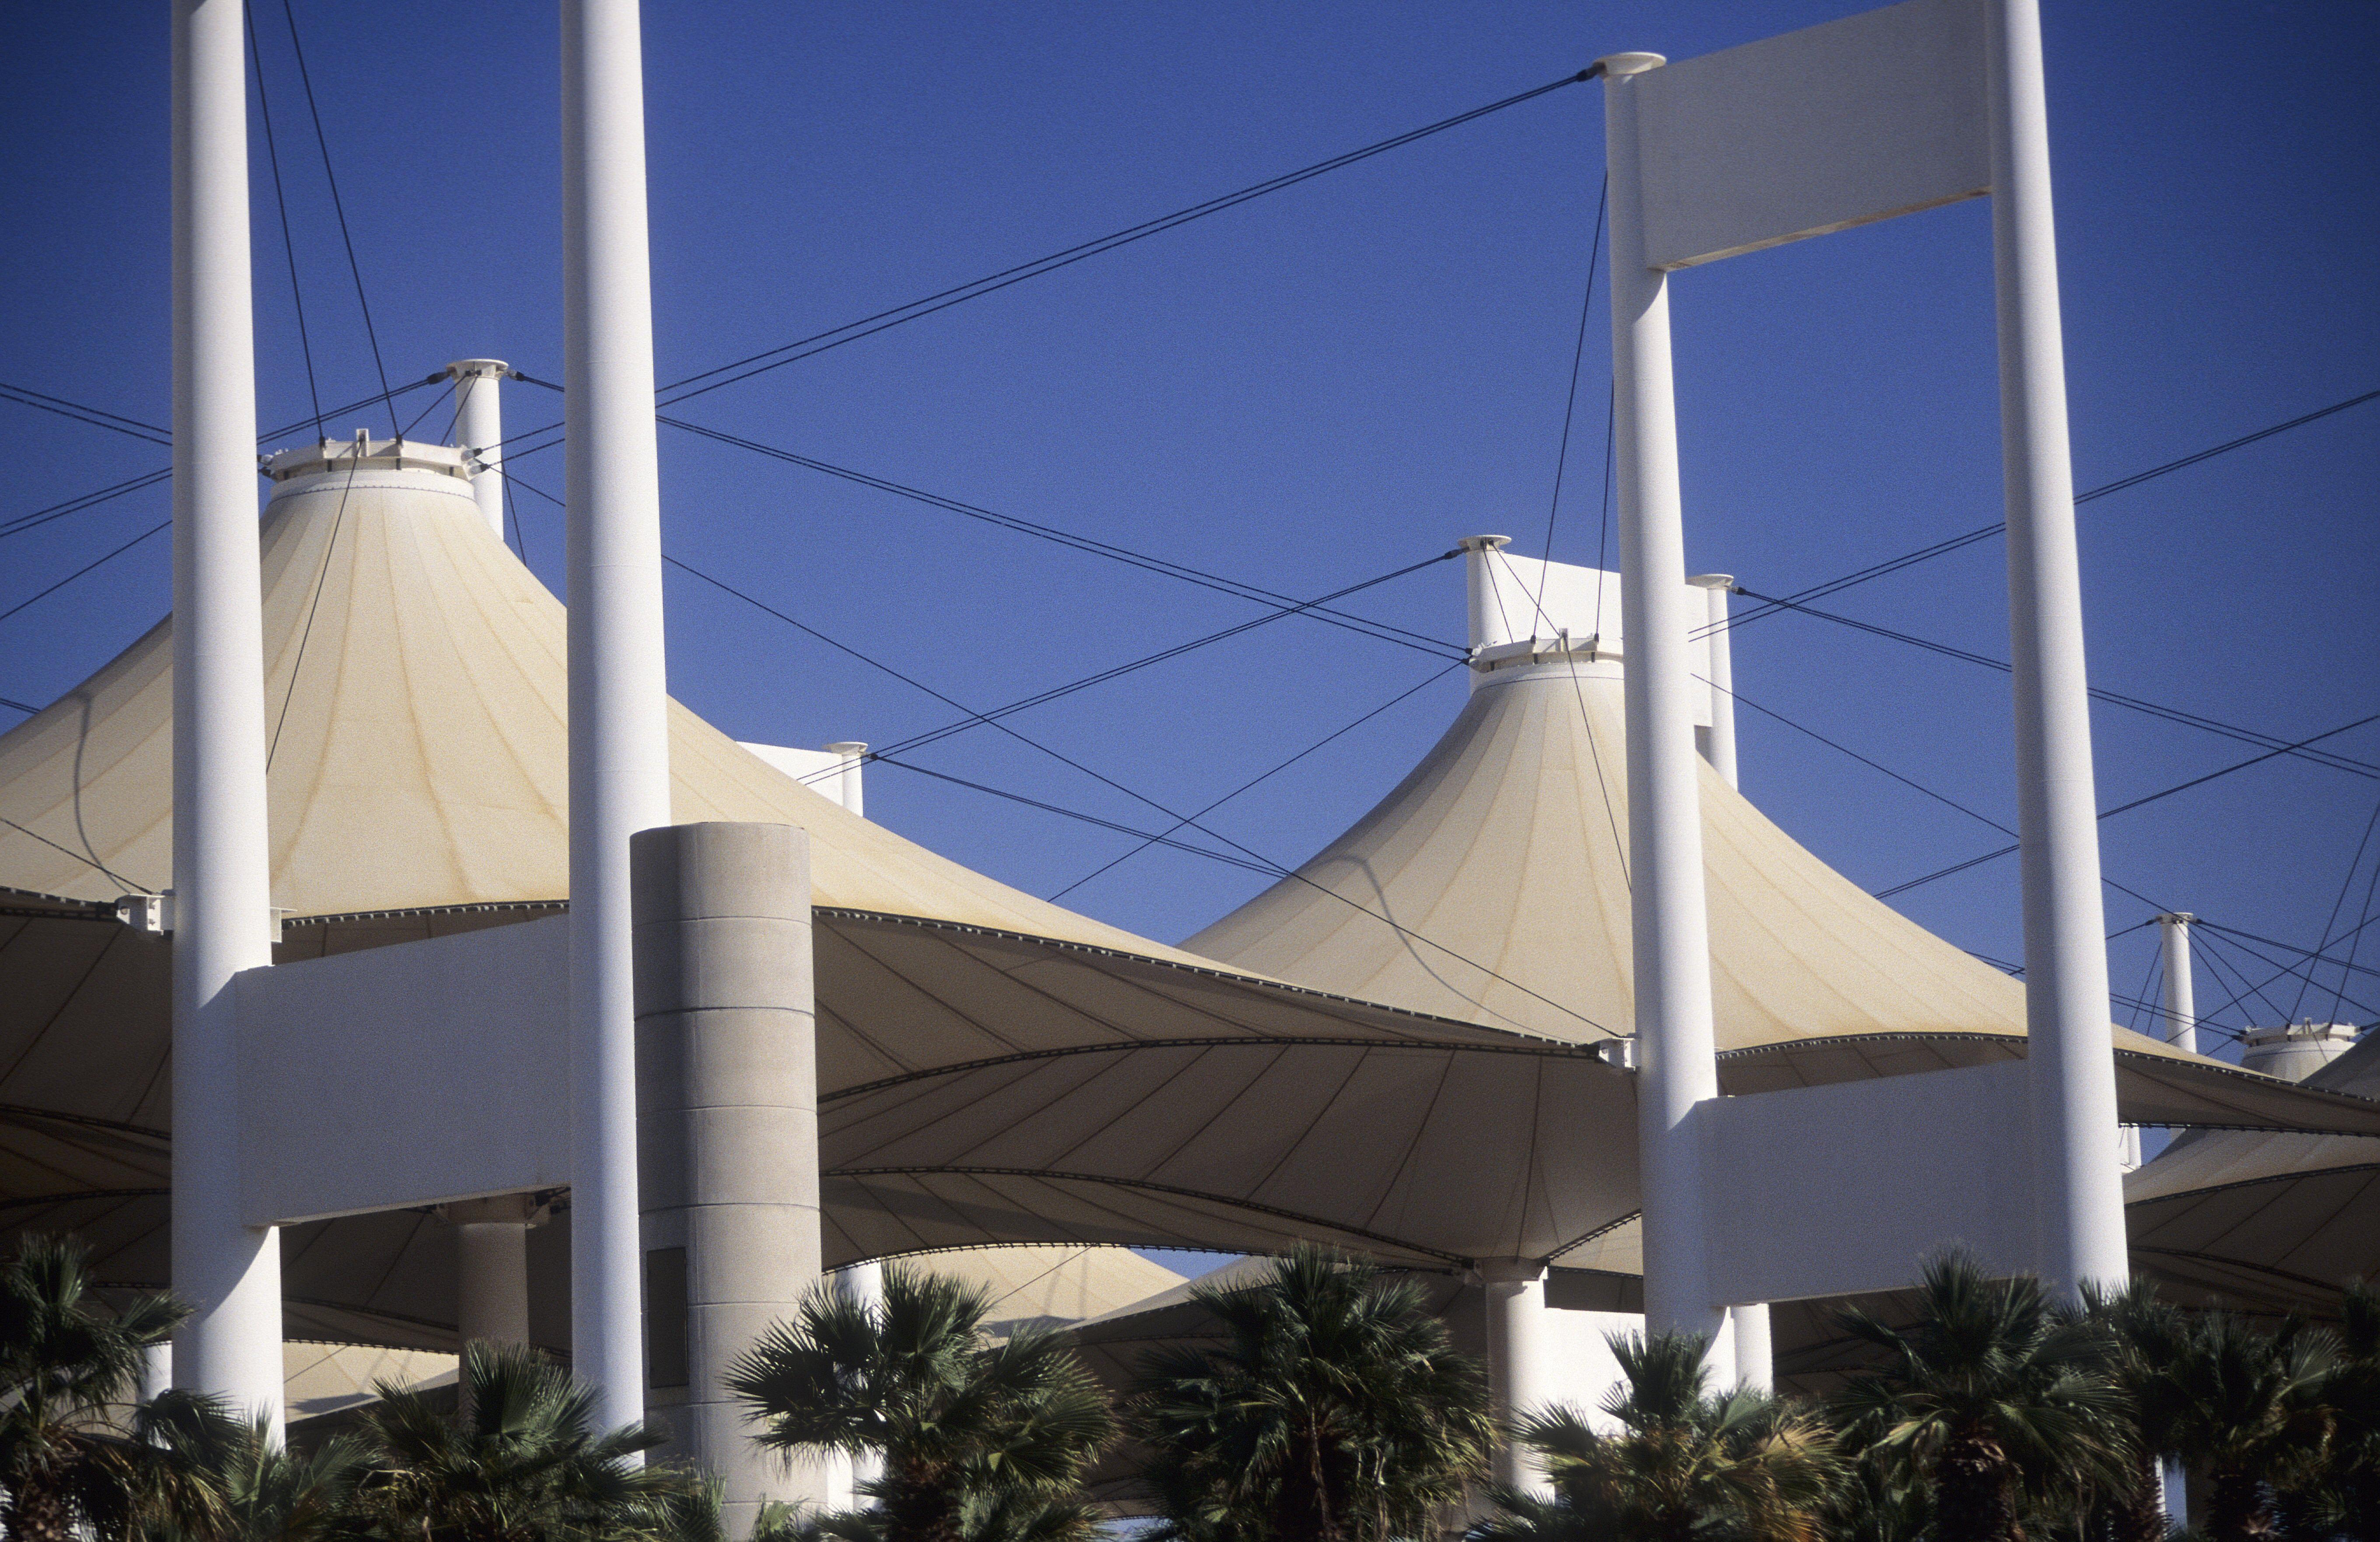 Tensile architecture, Hajj Terminal designed by Gordon Bunshaft, Jeddah, Saudi Arabia